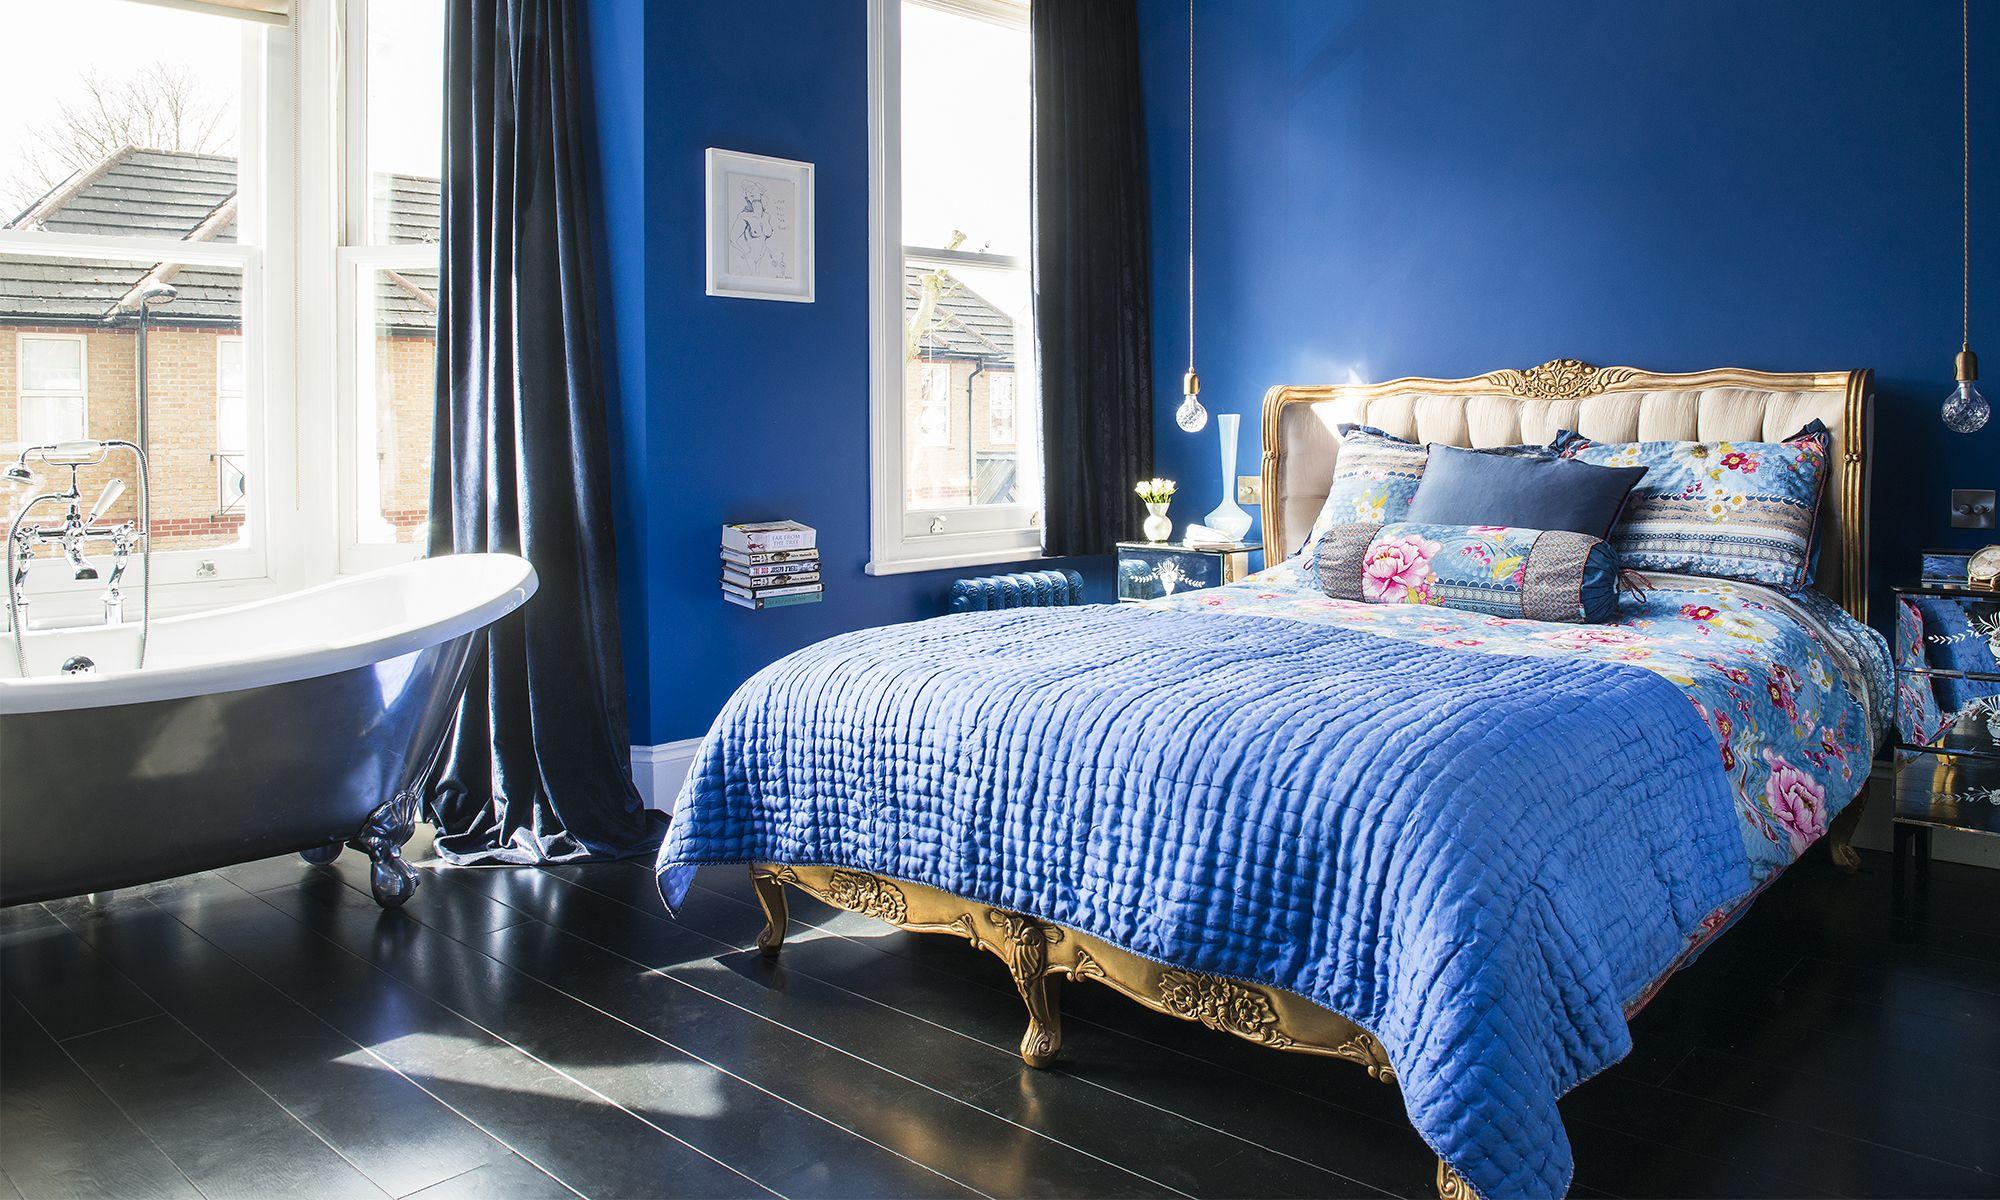 Romantic bedroom ideas - Romantic bedroom designs | Couple ...